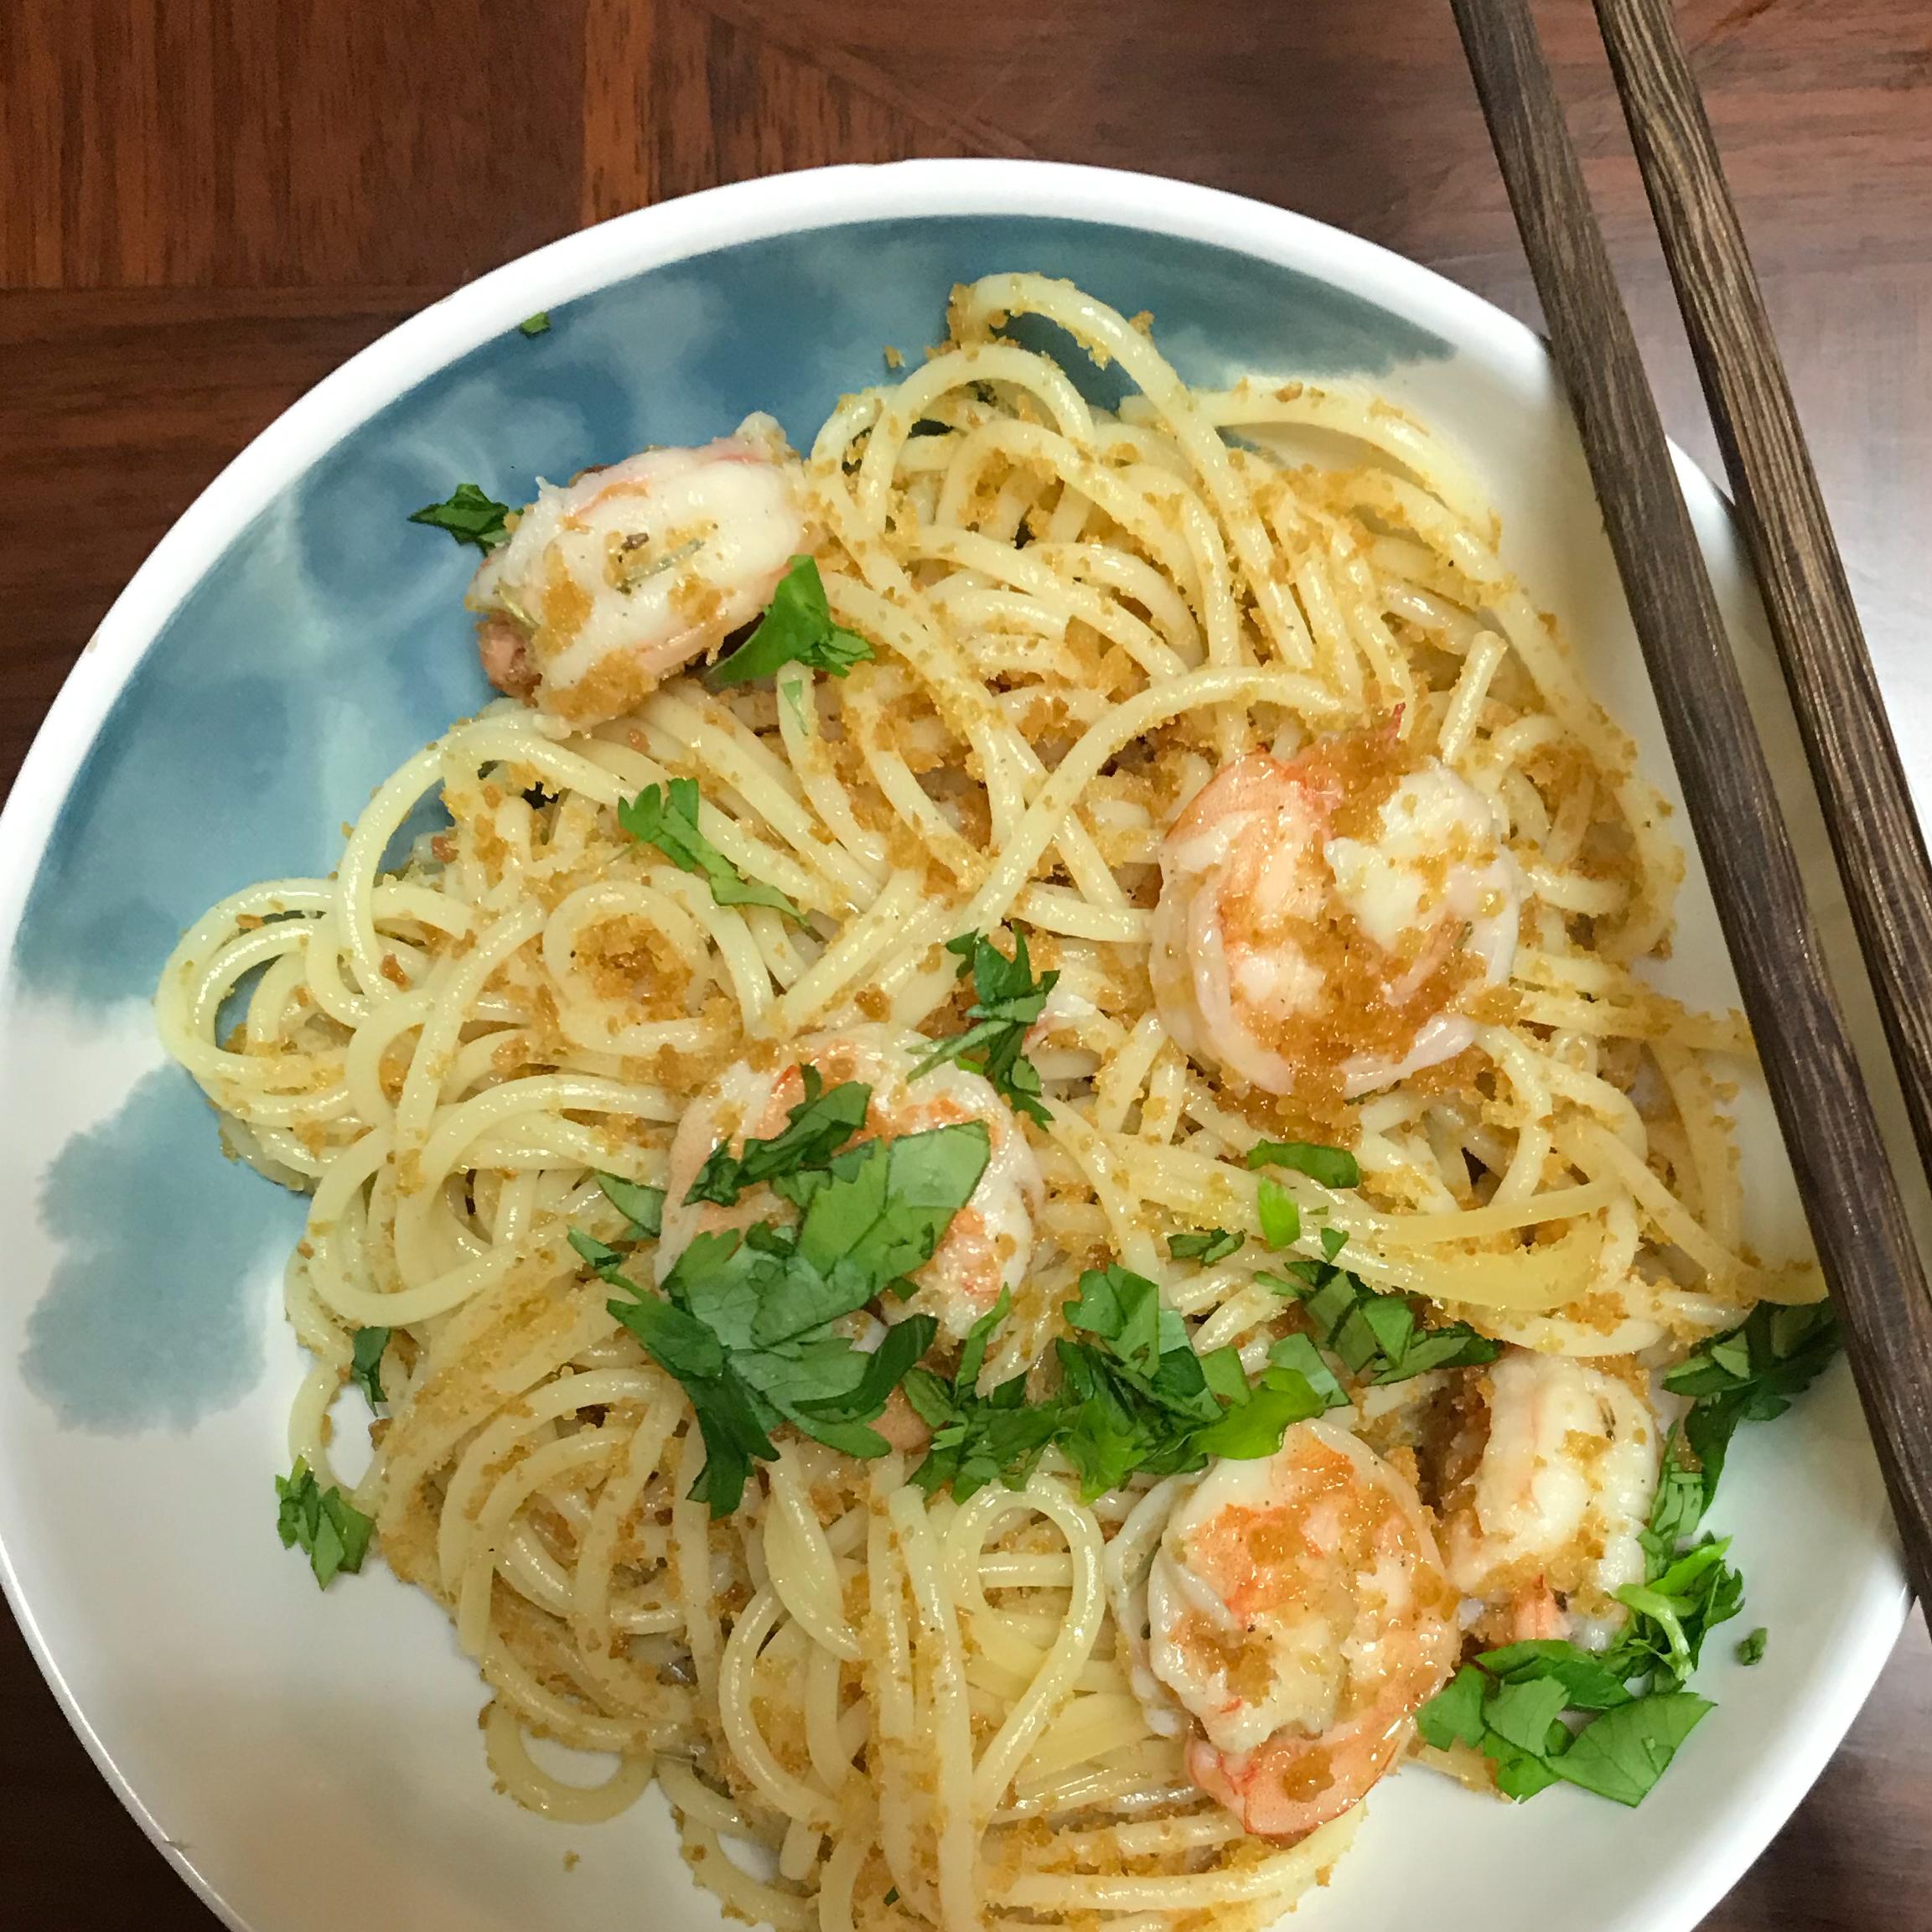 Shrimp Spaghetti with Crumbs jonanjing